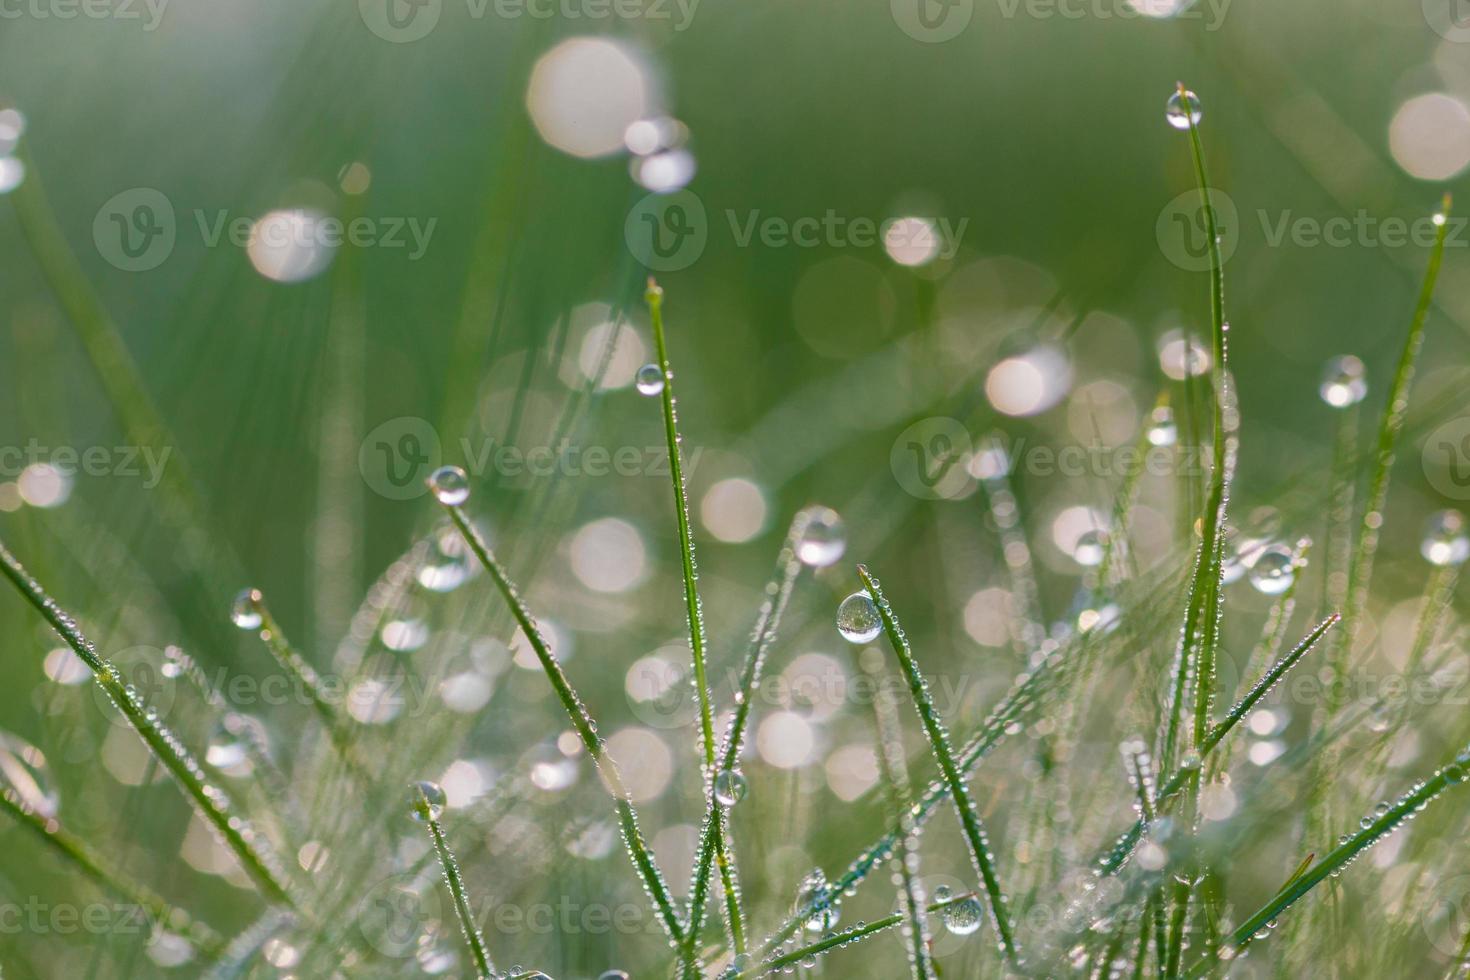 frischer Morgentau auf Frühlingsgras foto